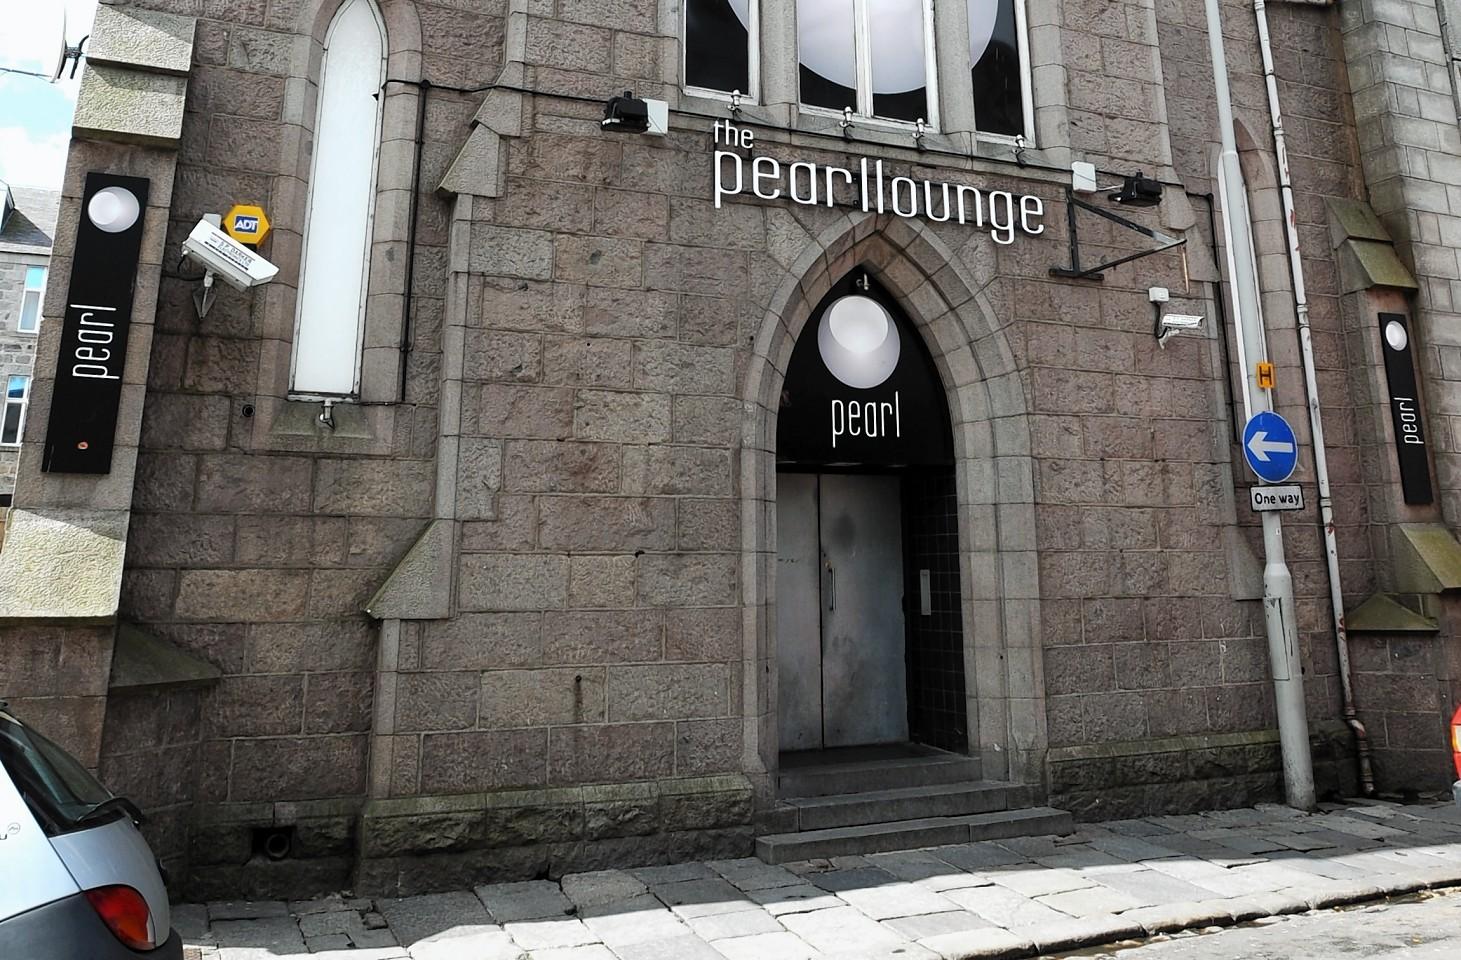 Nightclub drops plans for hot tub and bucking broncos